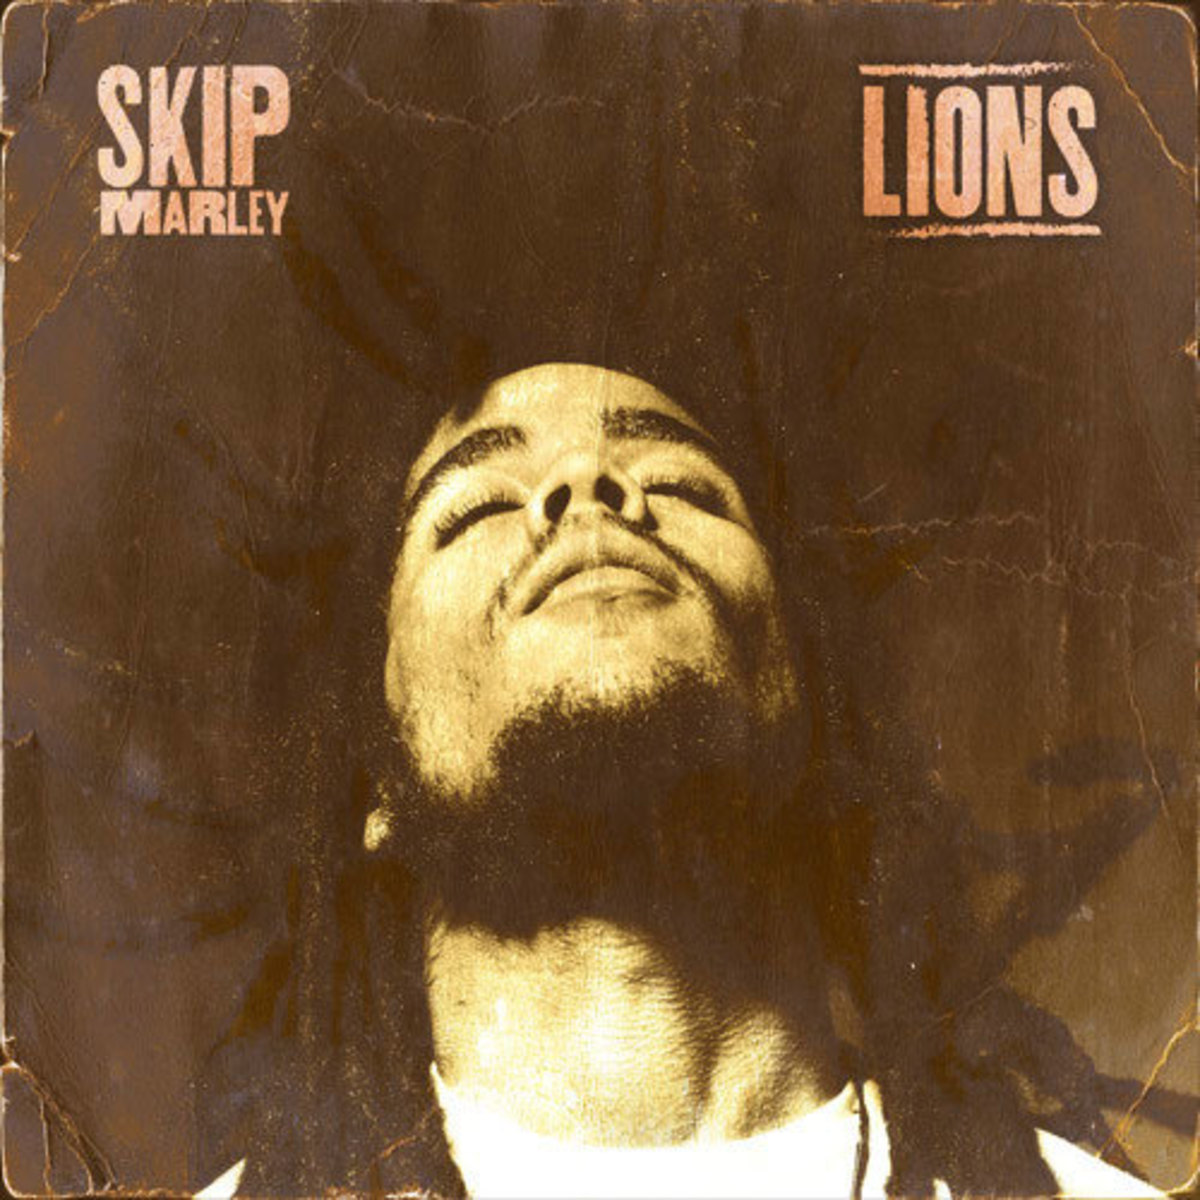 skip-marley-lions.jpg